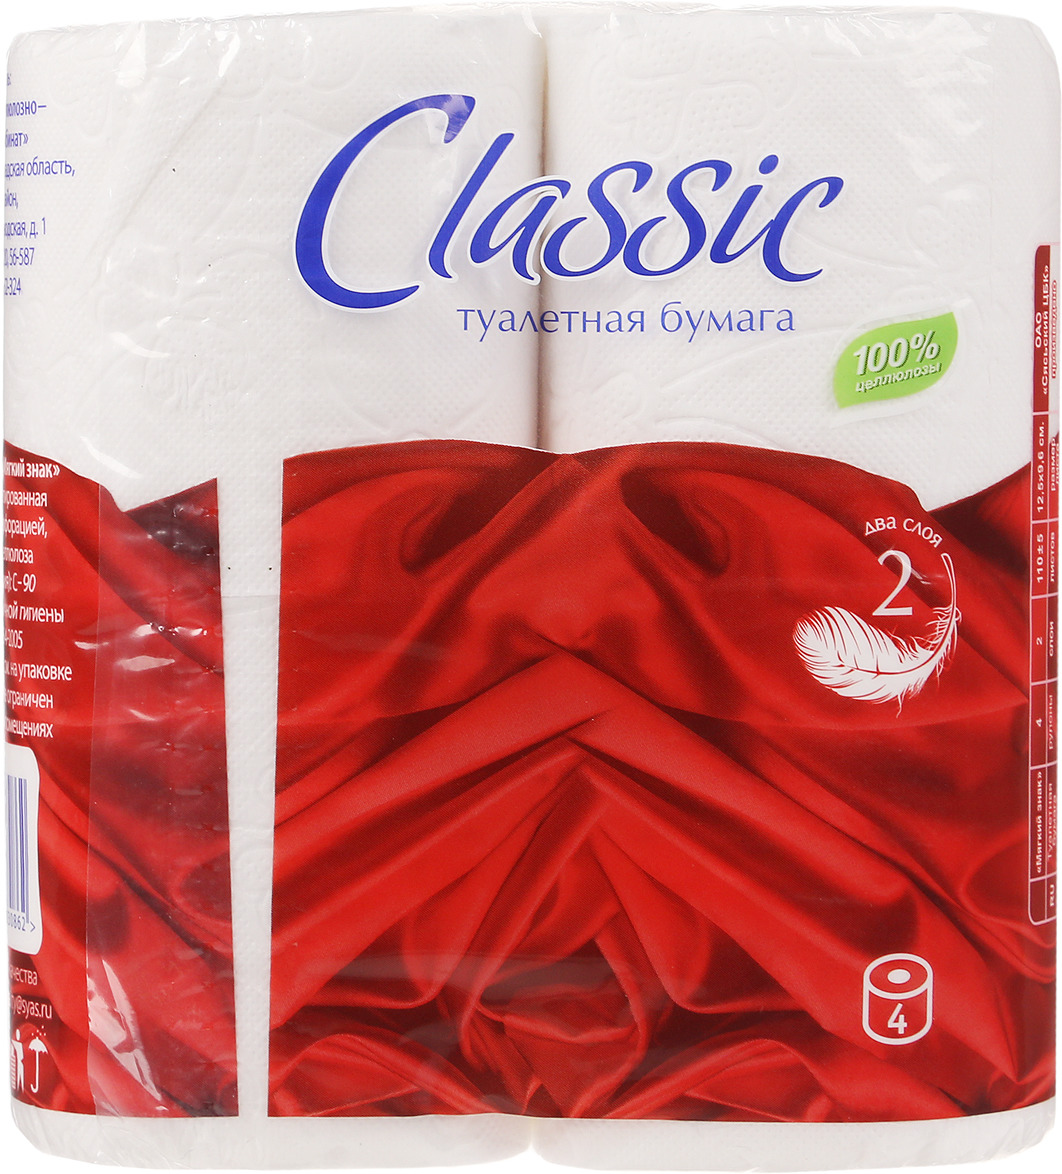 Туалетная бумага Мягкий знак Comfort, двухслойная, цвет: белый, 4 рулона туалетная бумага familia plus магический цветок двухслойная цвет белый 4 шт